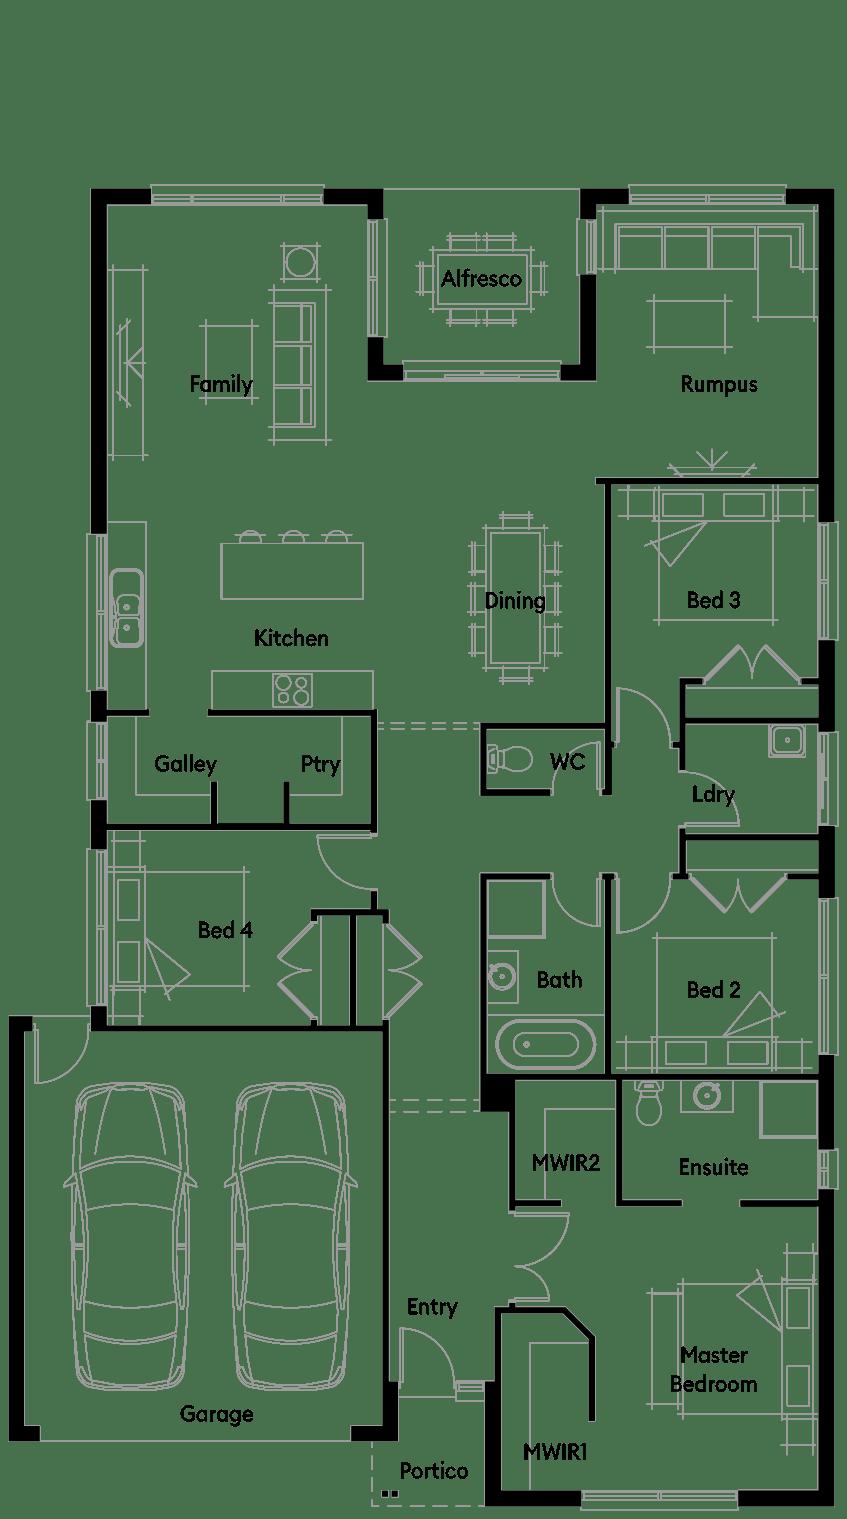 FloorPlan1_HOUSE761_Liverpool_25-2